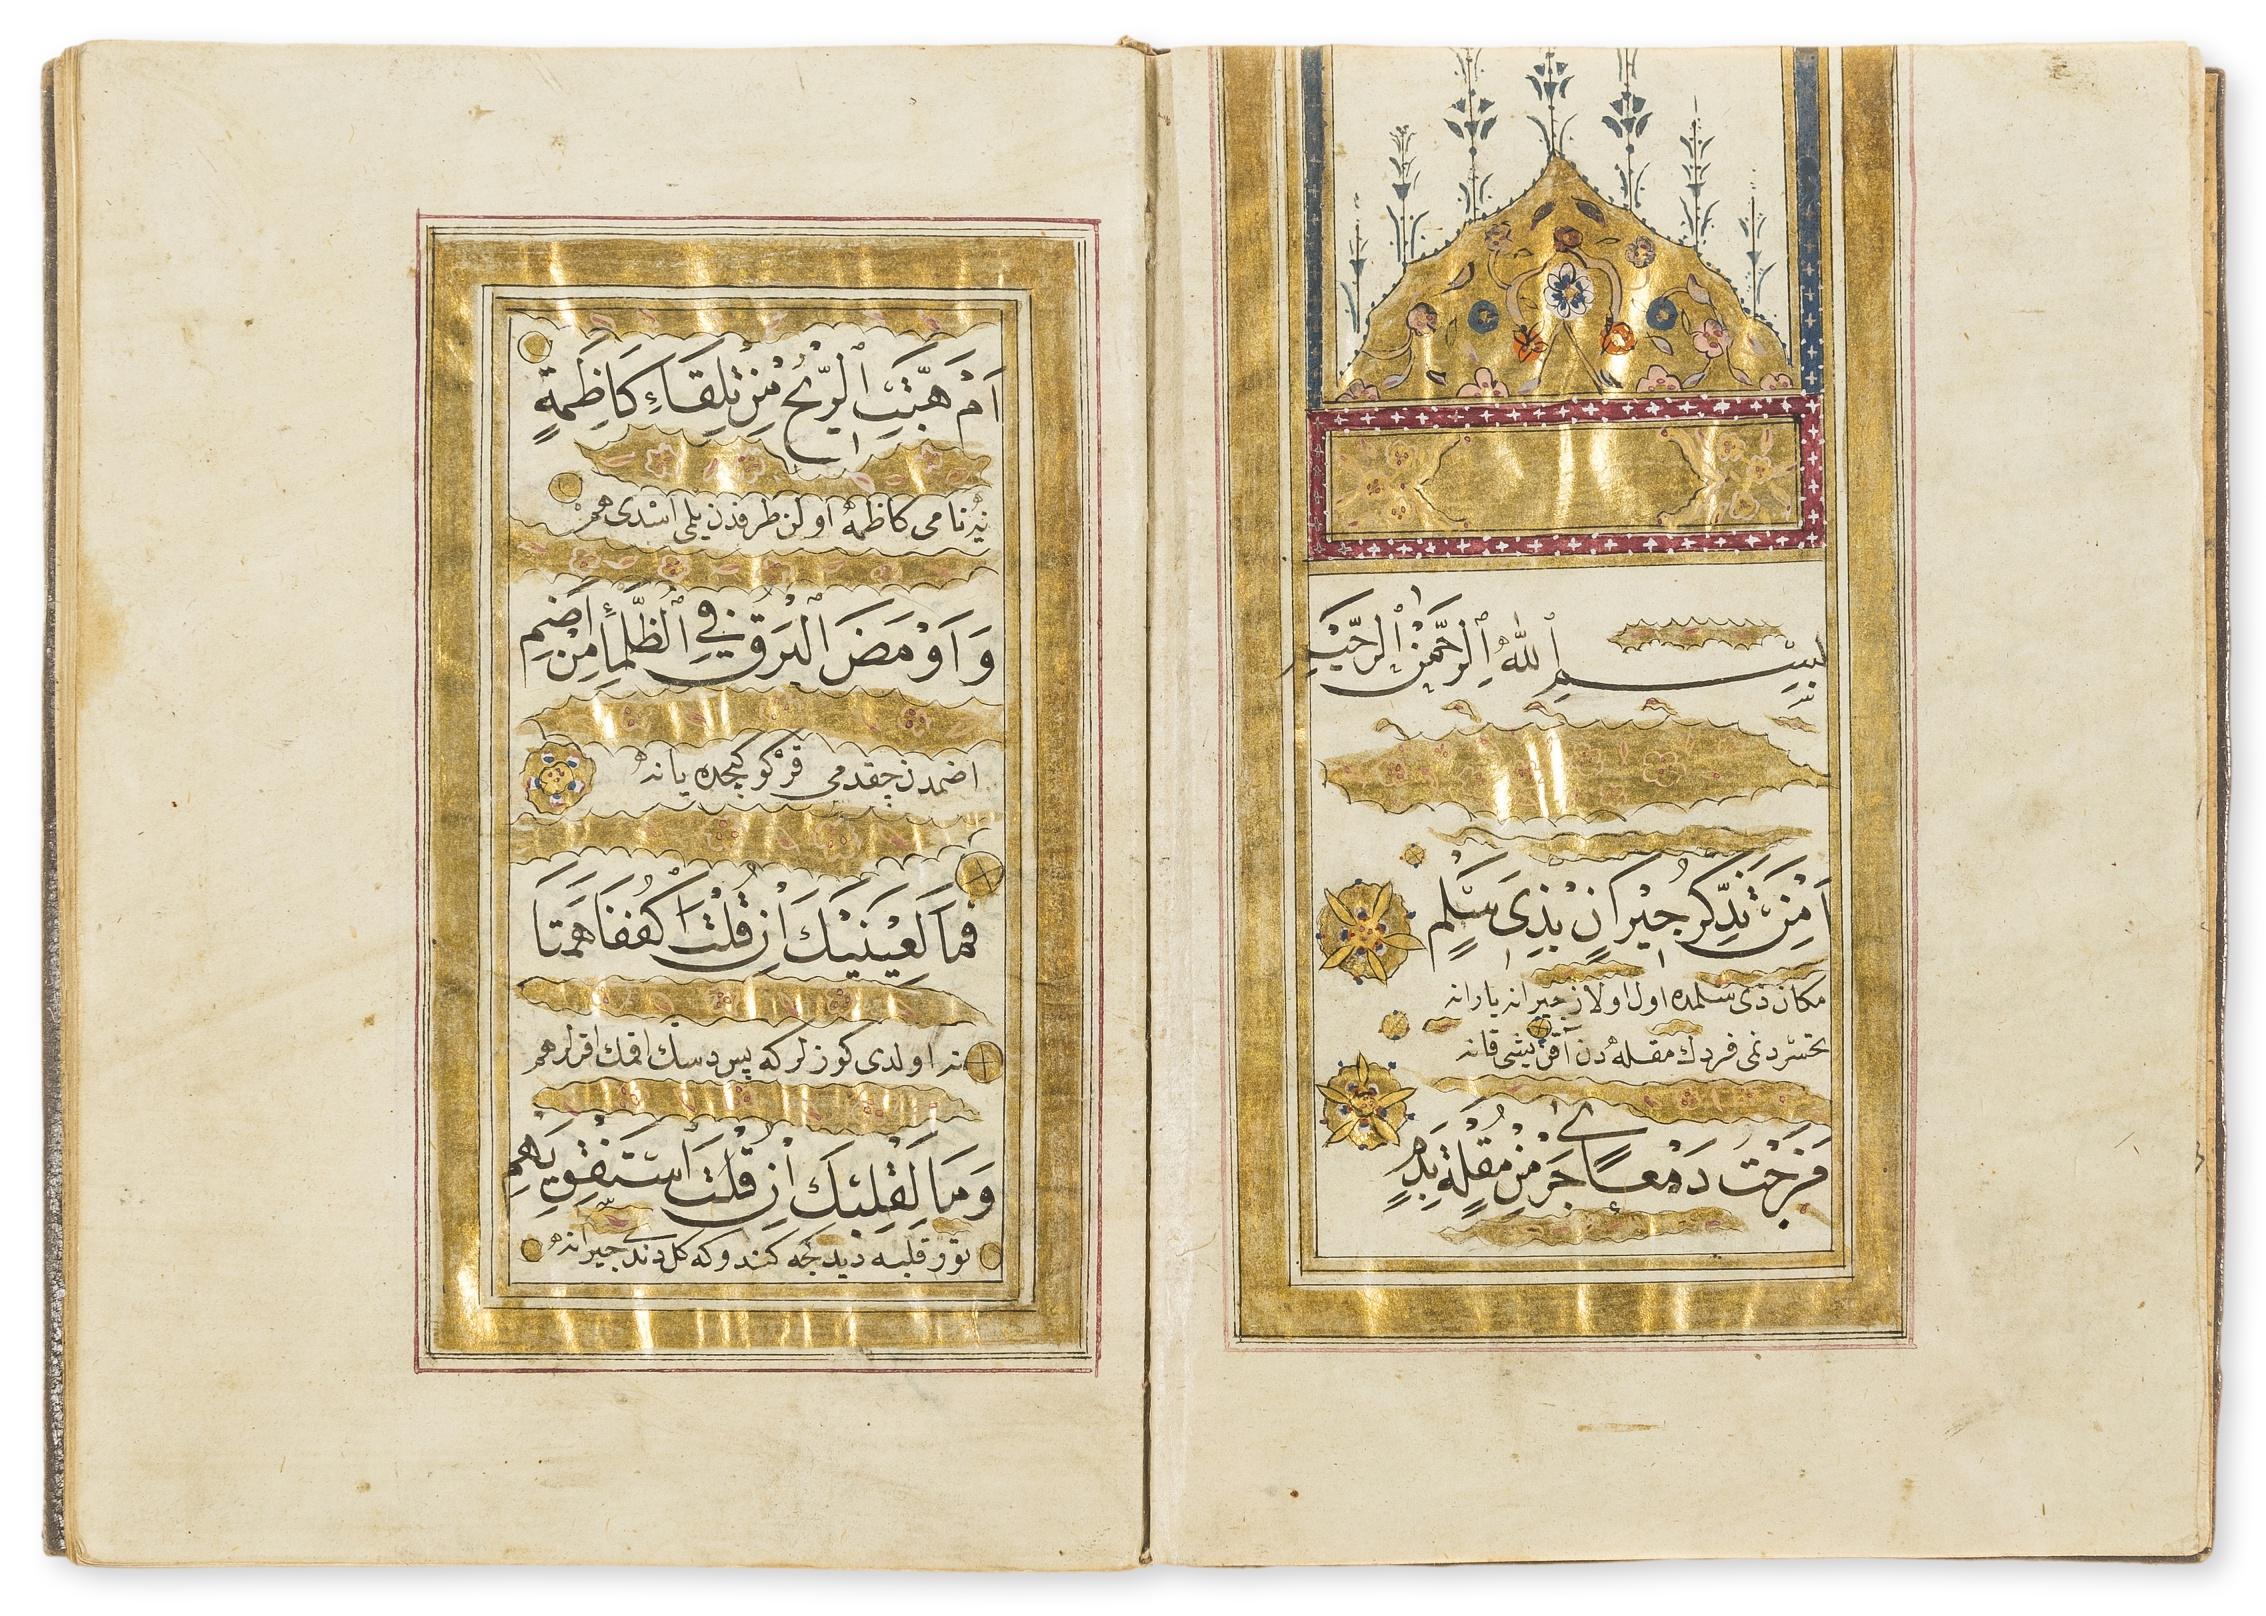 Middle Eastern ms.- Sharaf al-Din Abu 'Abdallah Muhammad bin Sa'id al-Dalasi al-Busiri al-Sanhaji …